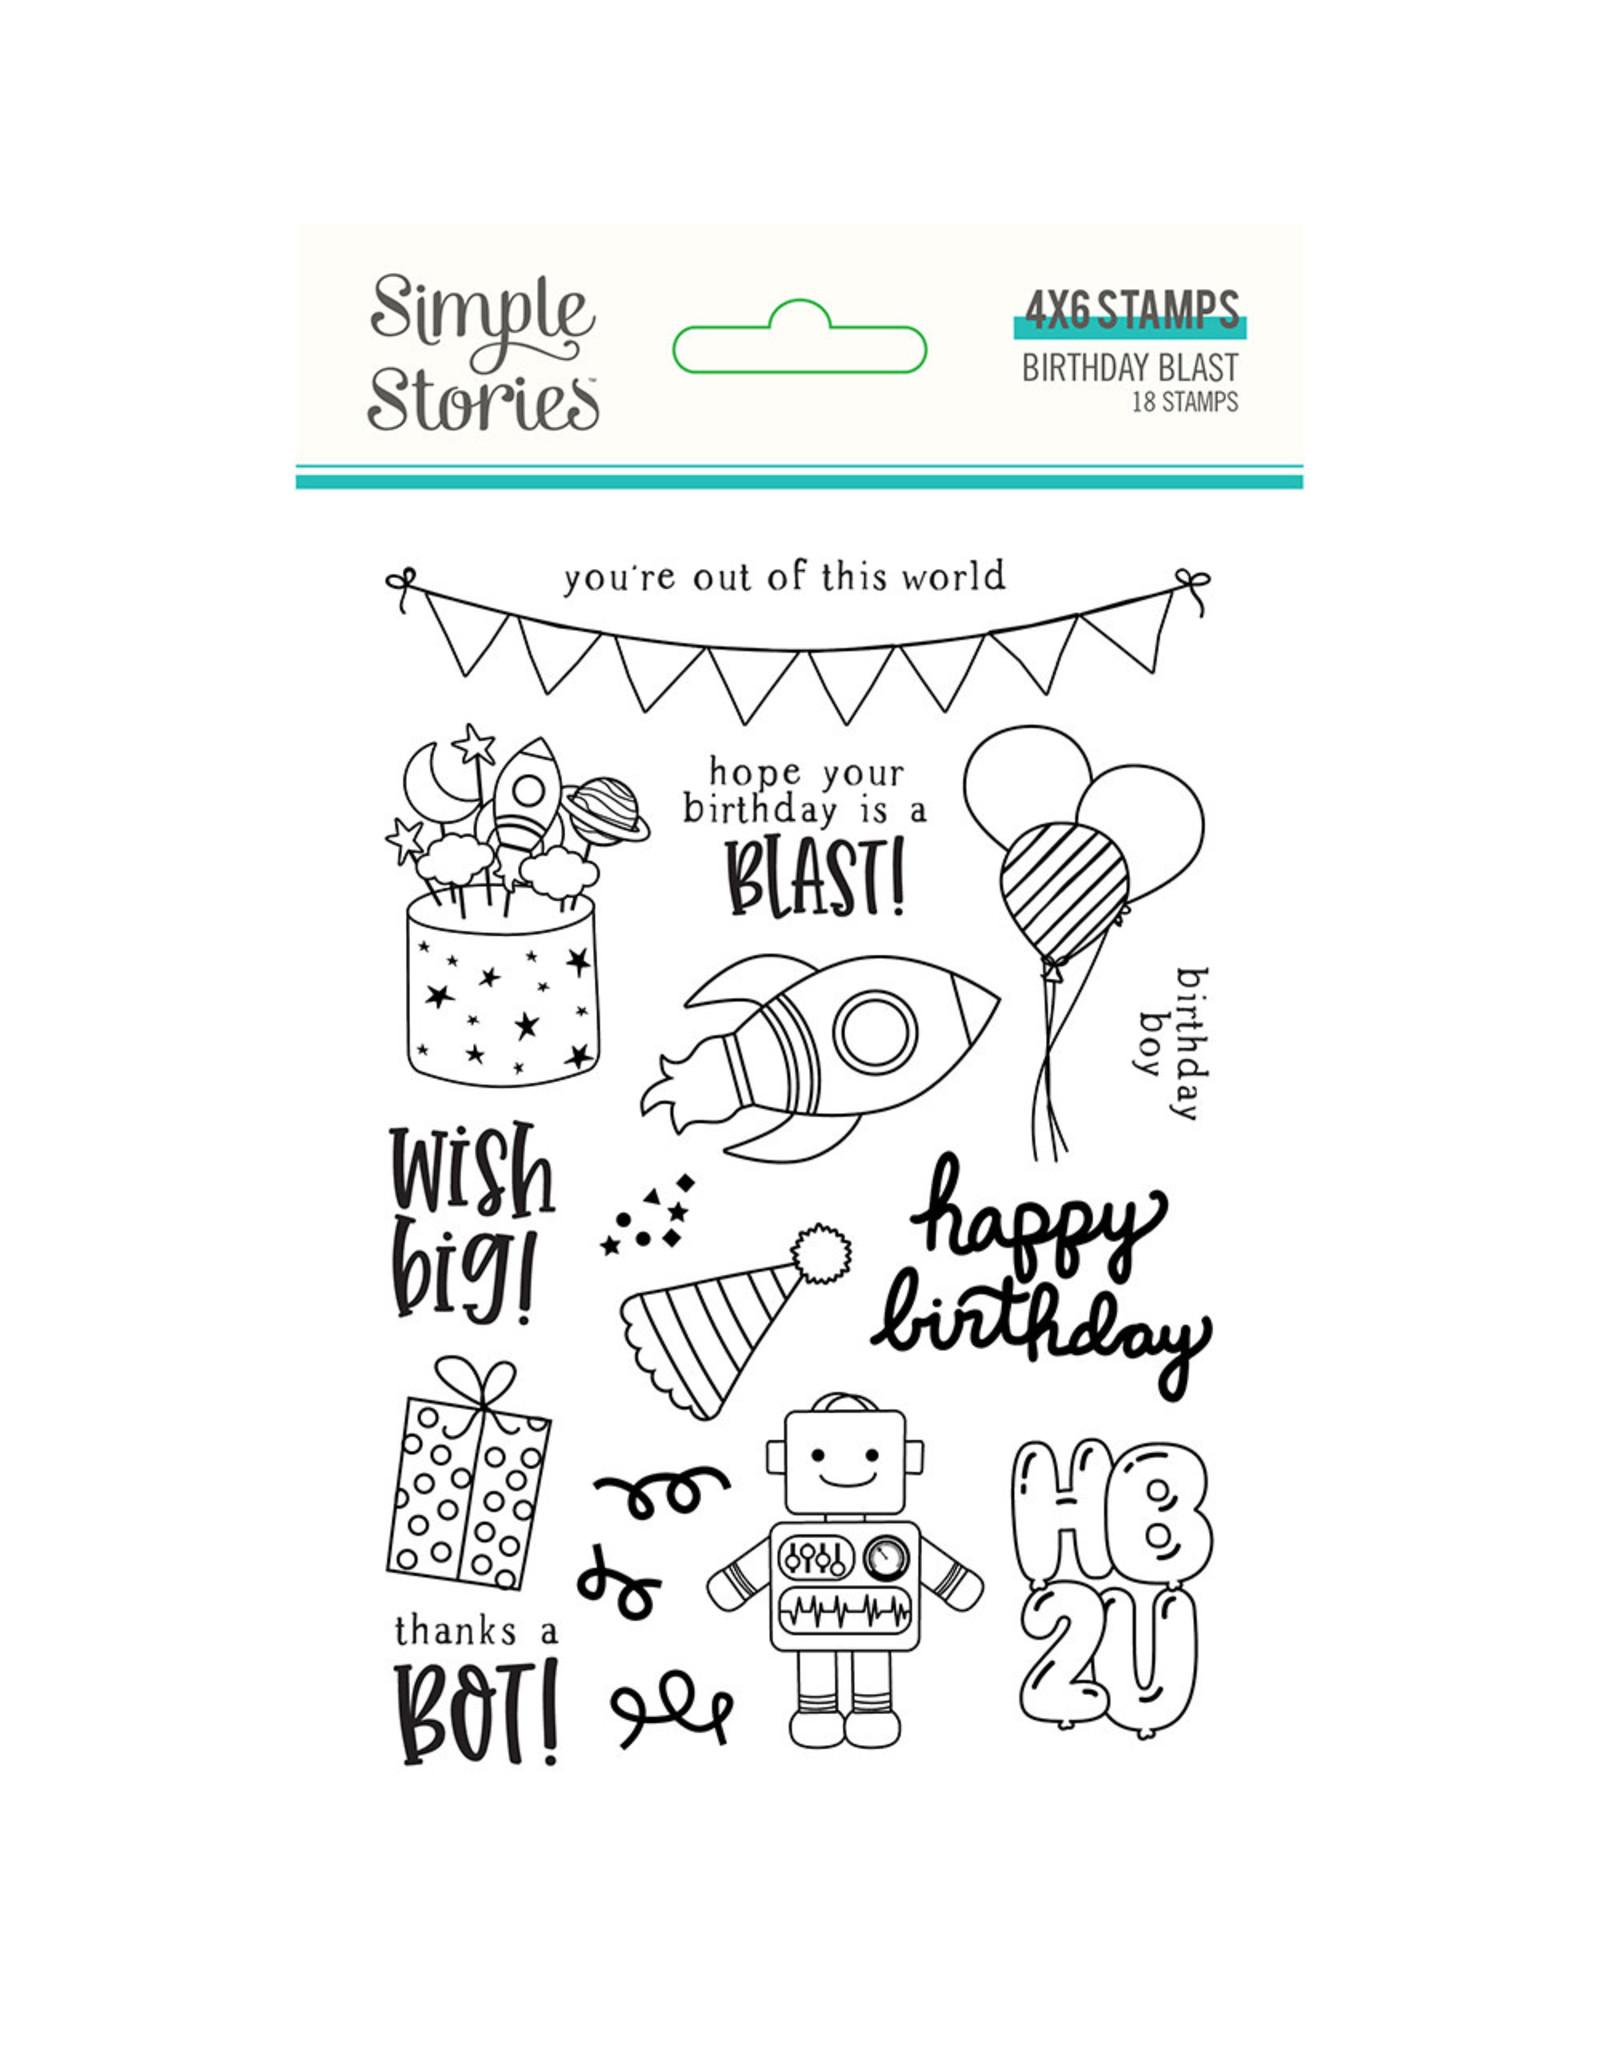 Simple Stories Birthday Blast Stamps